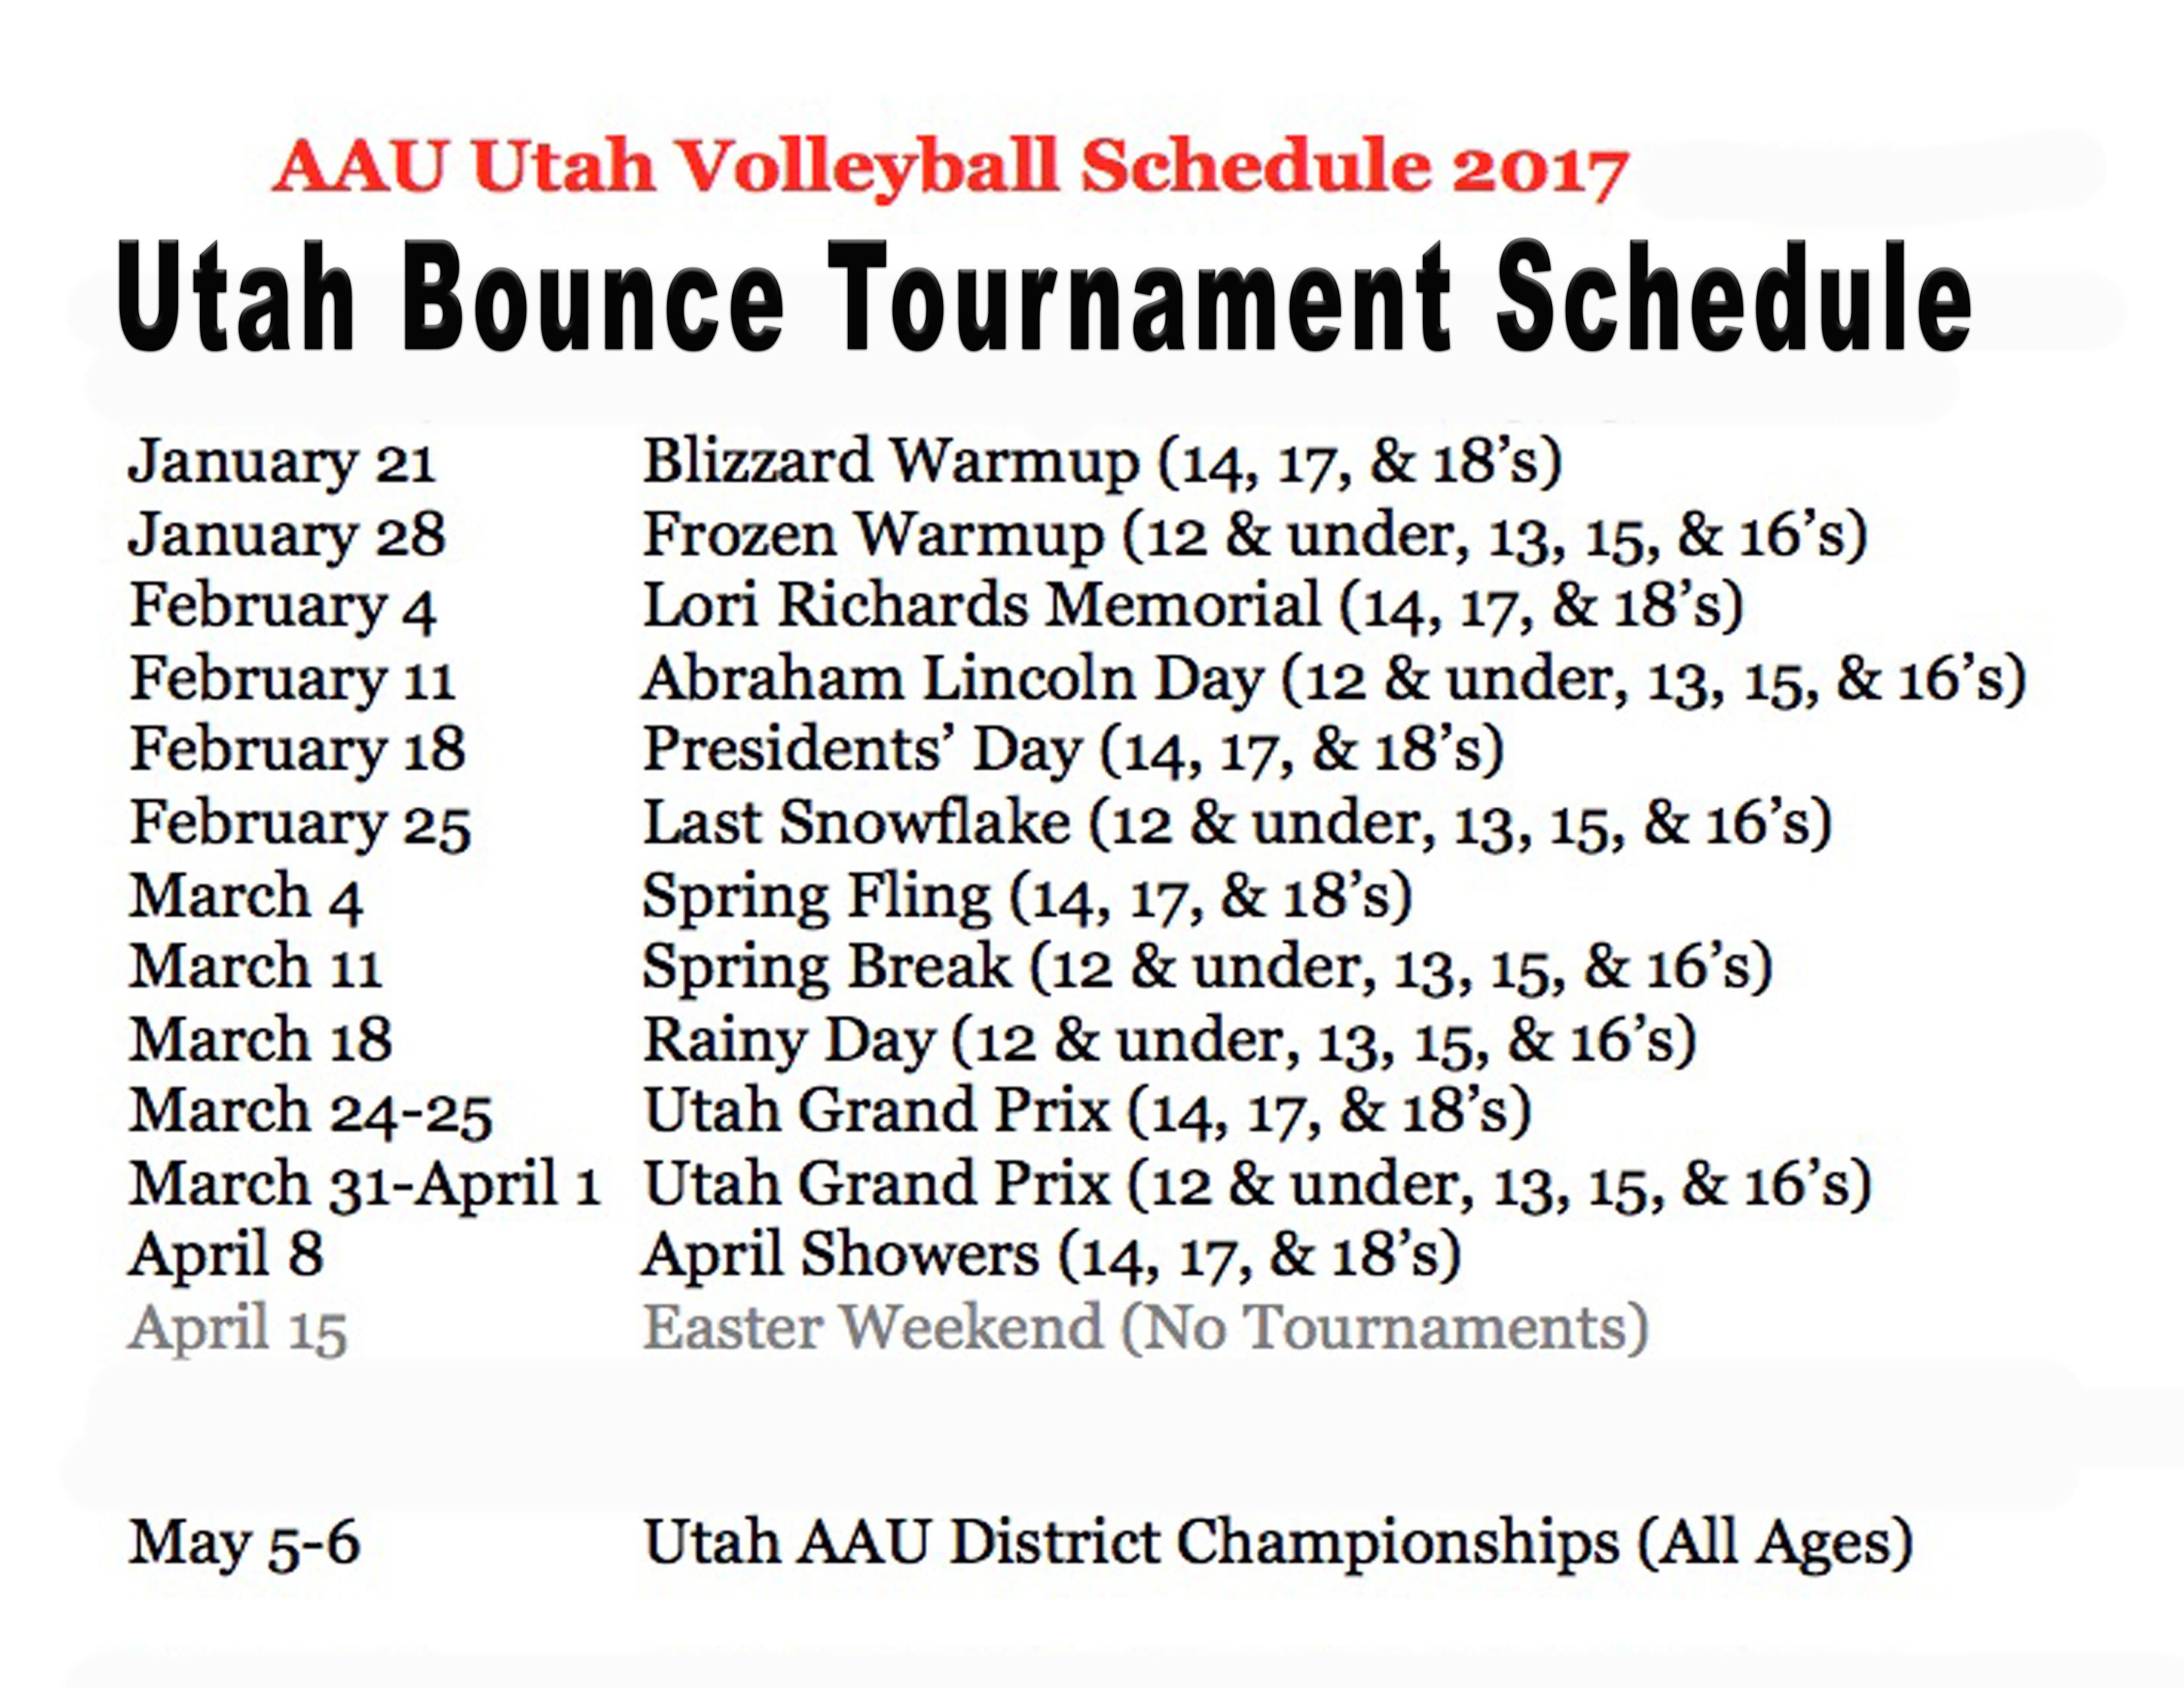 tournament-schedule-to-display